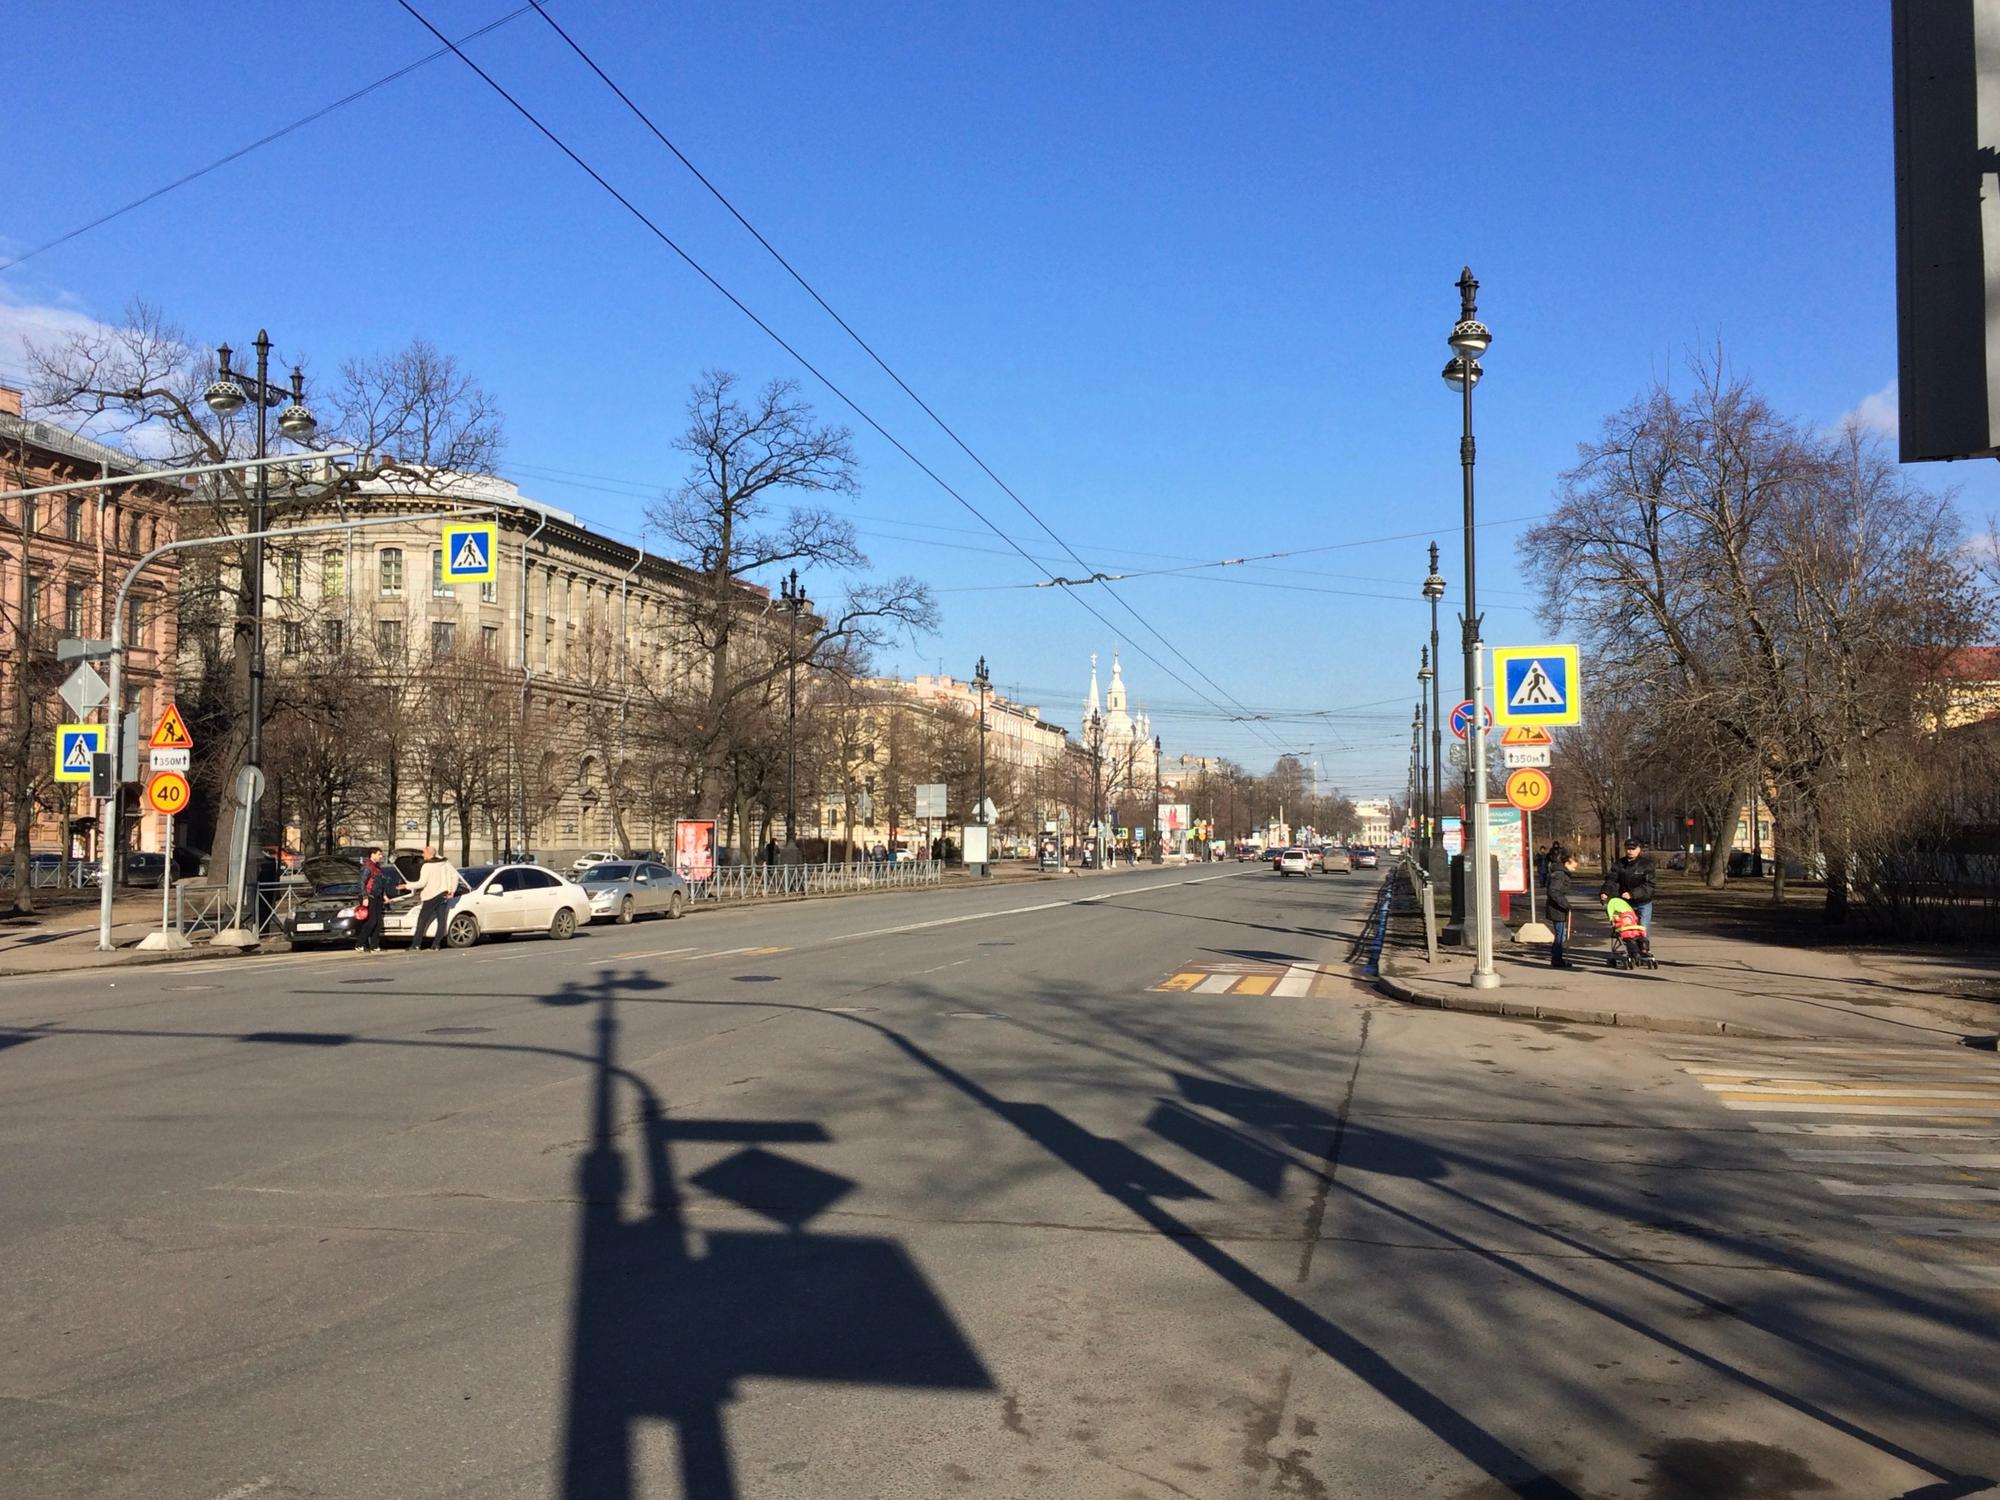 🇷🇺 Санкт-Петербург, Россия, март 2016.